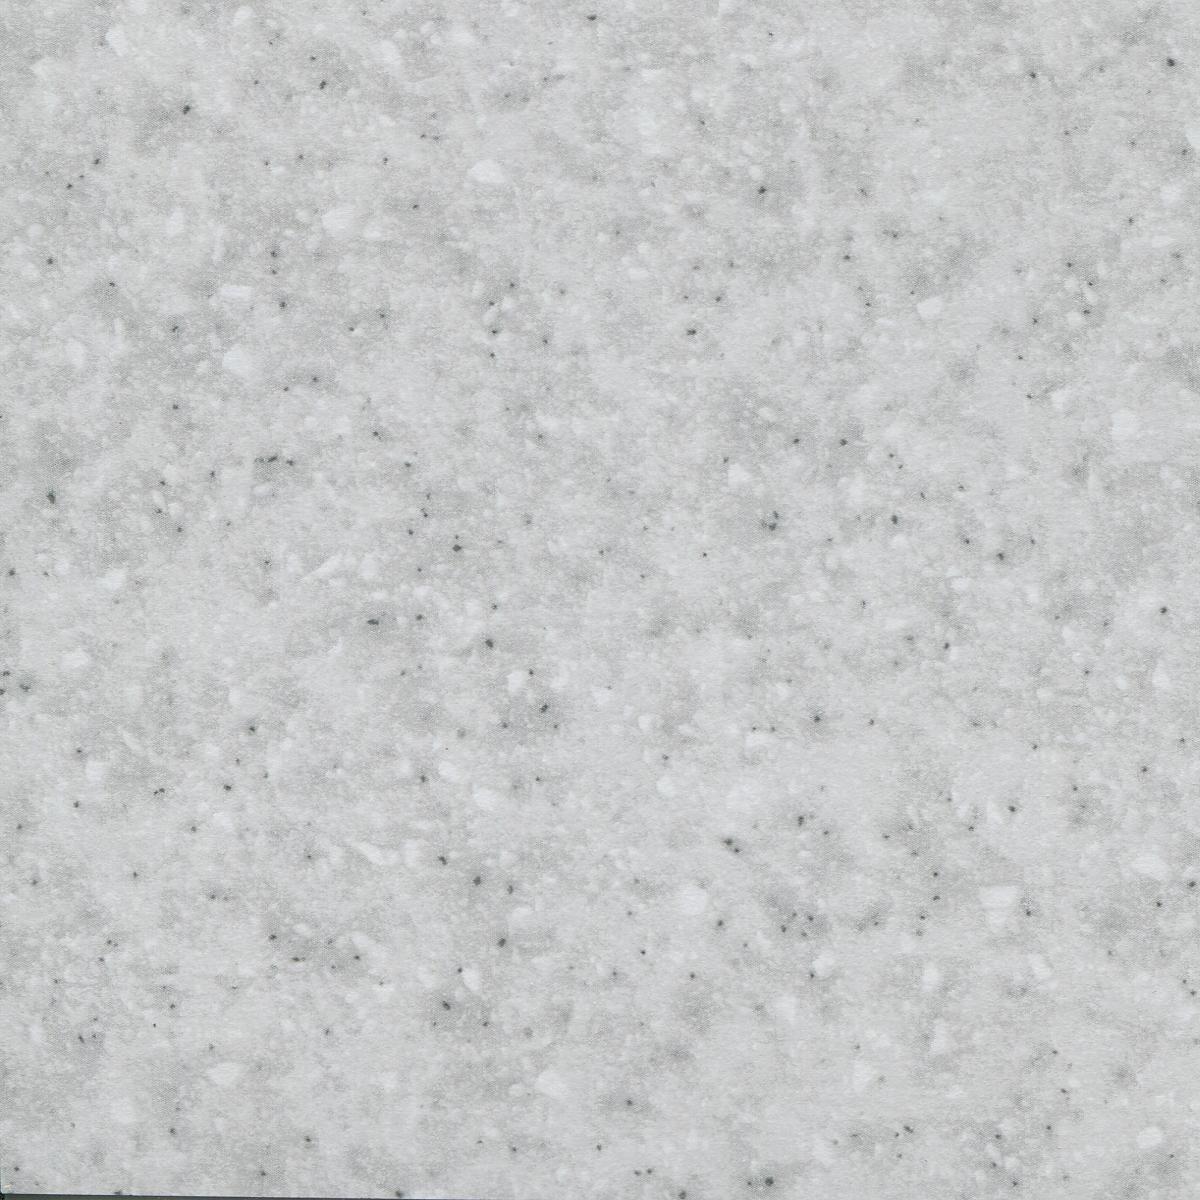 Столешница для кухни берилл стол из камня Алексино-Шатур